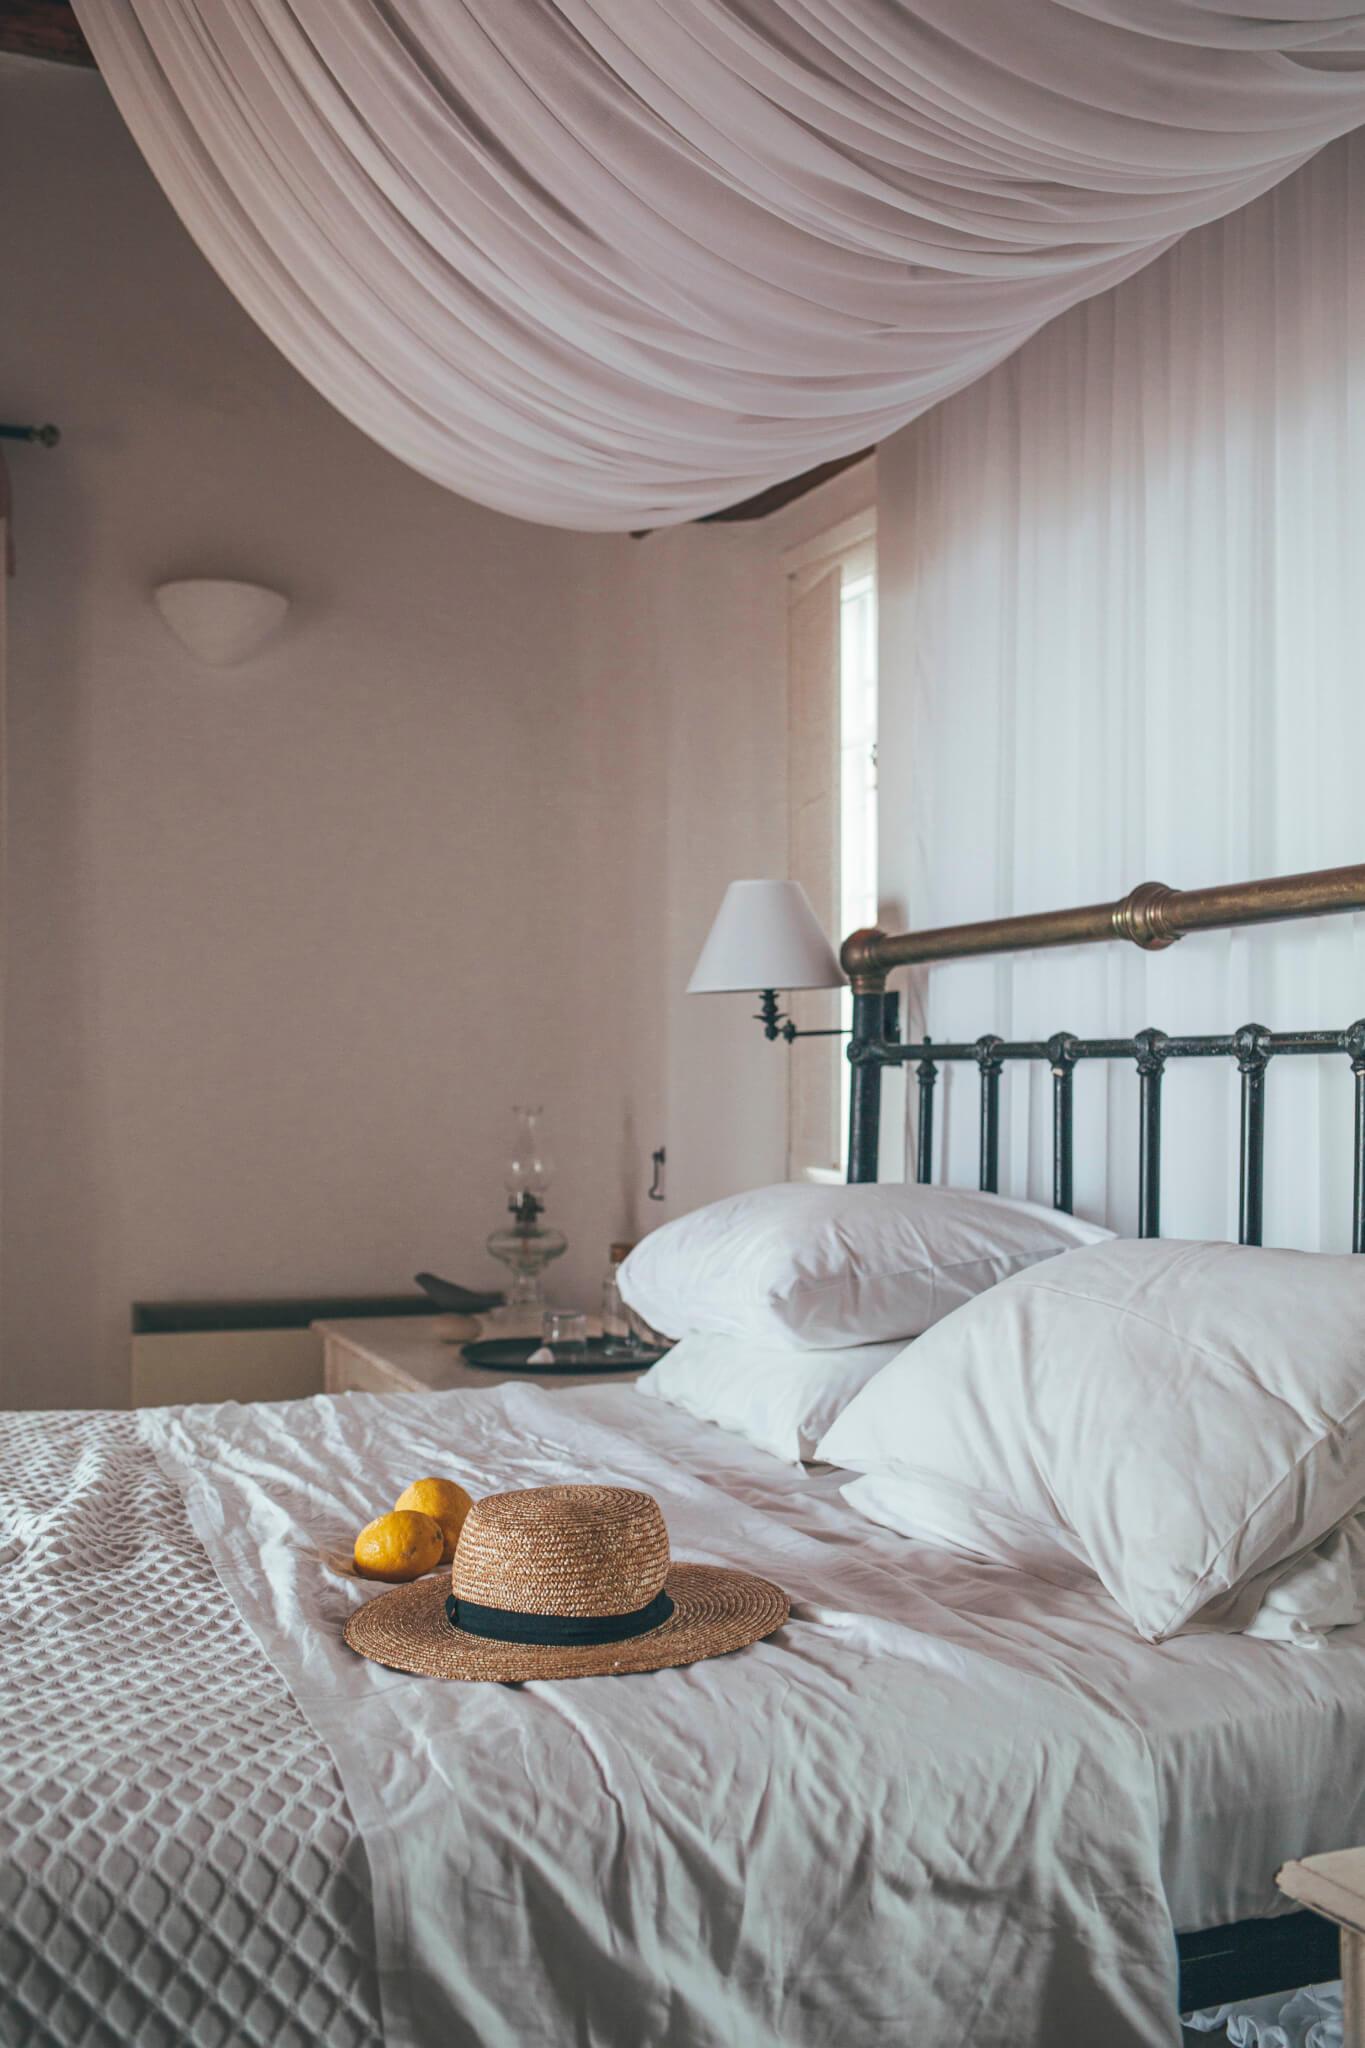 Dolce Vita Mykonos Villa rooms